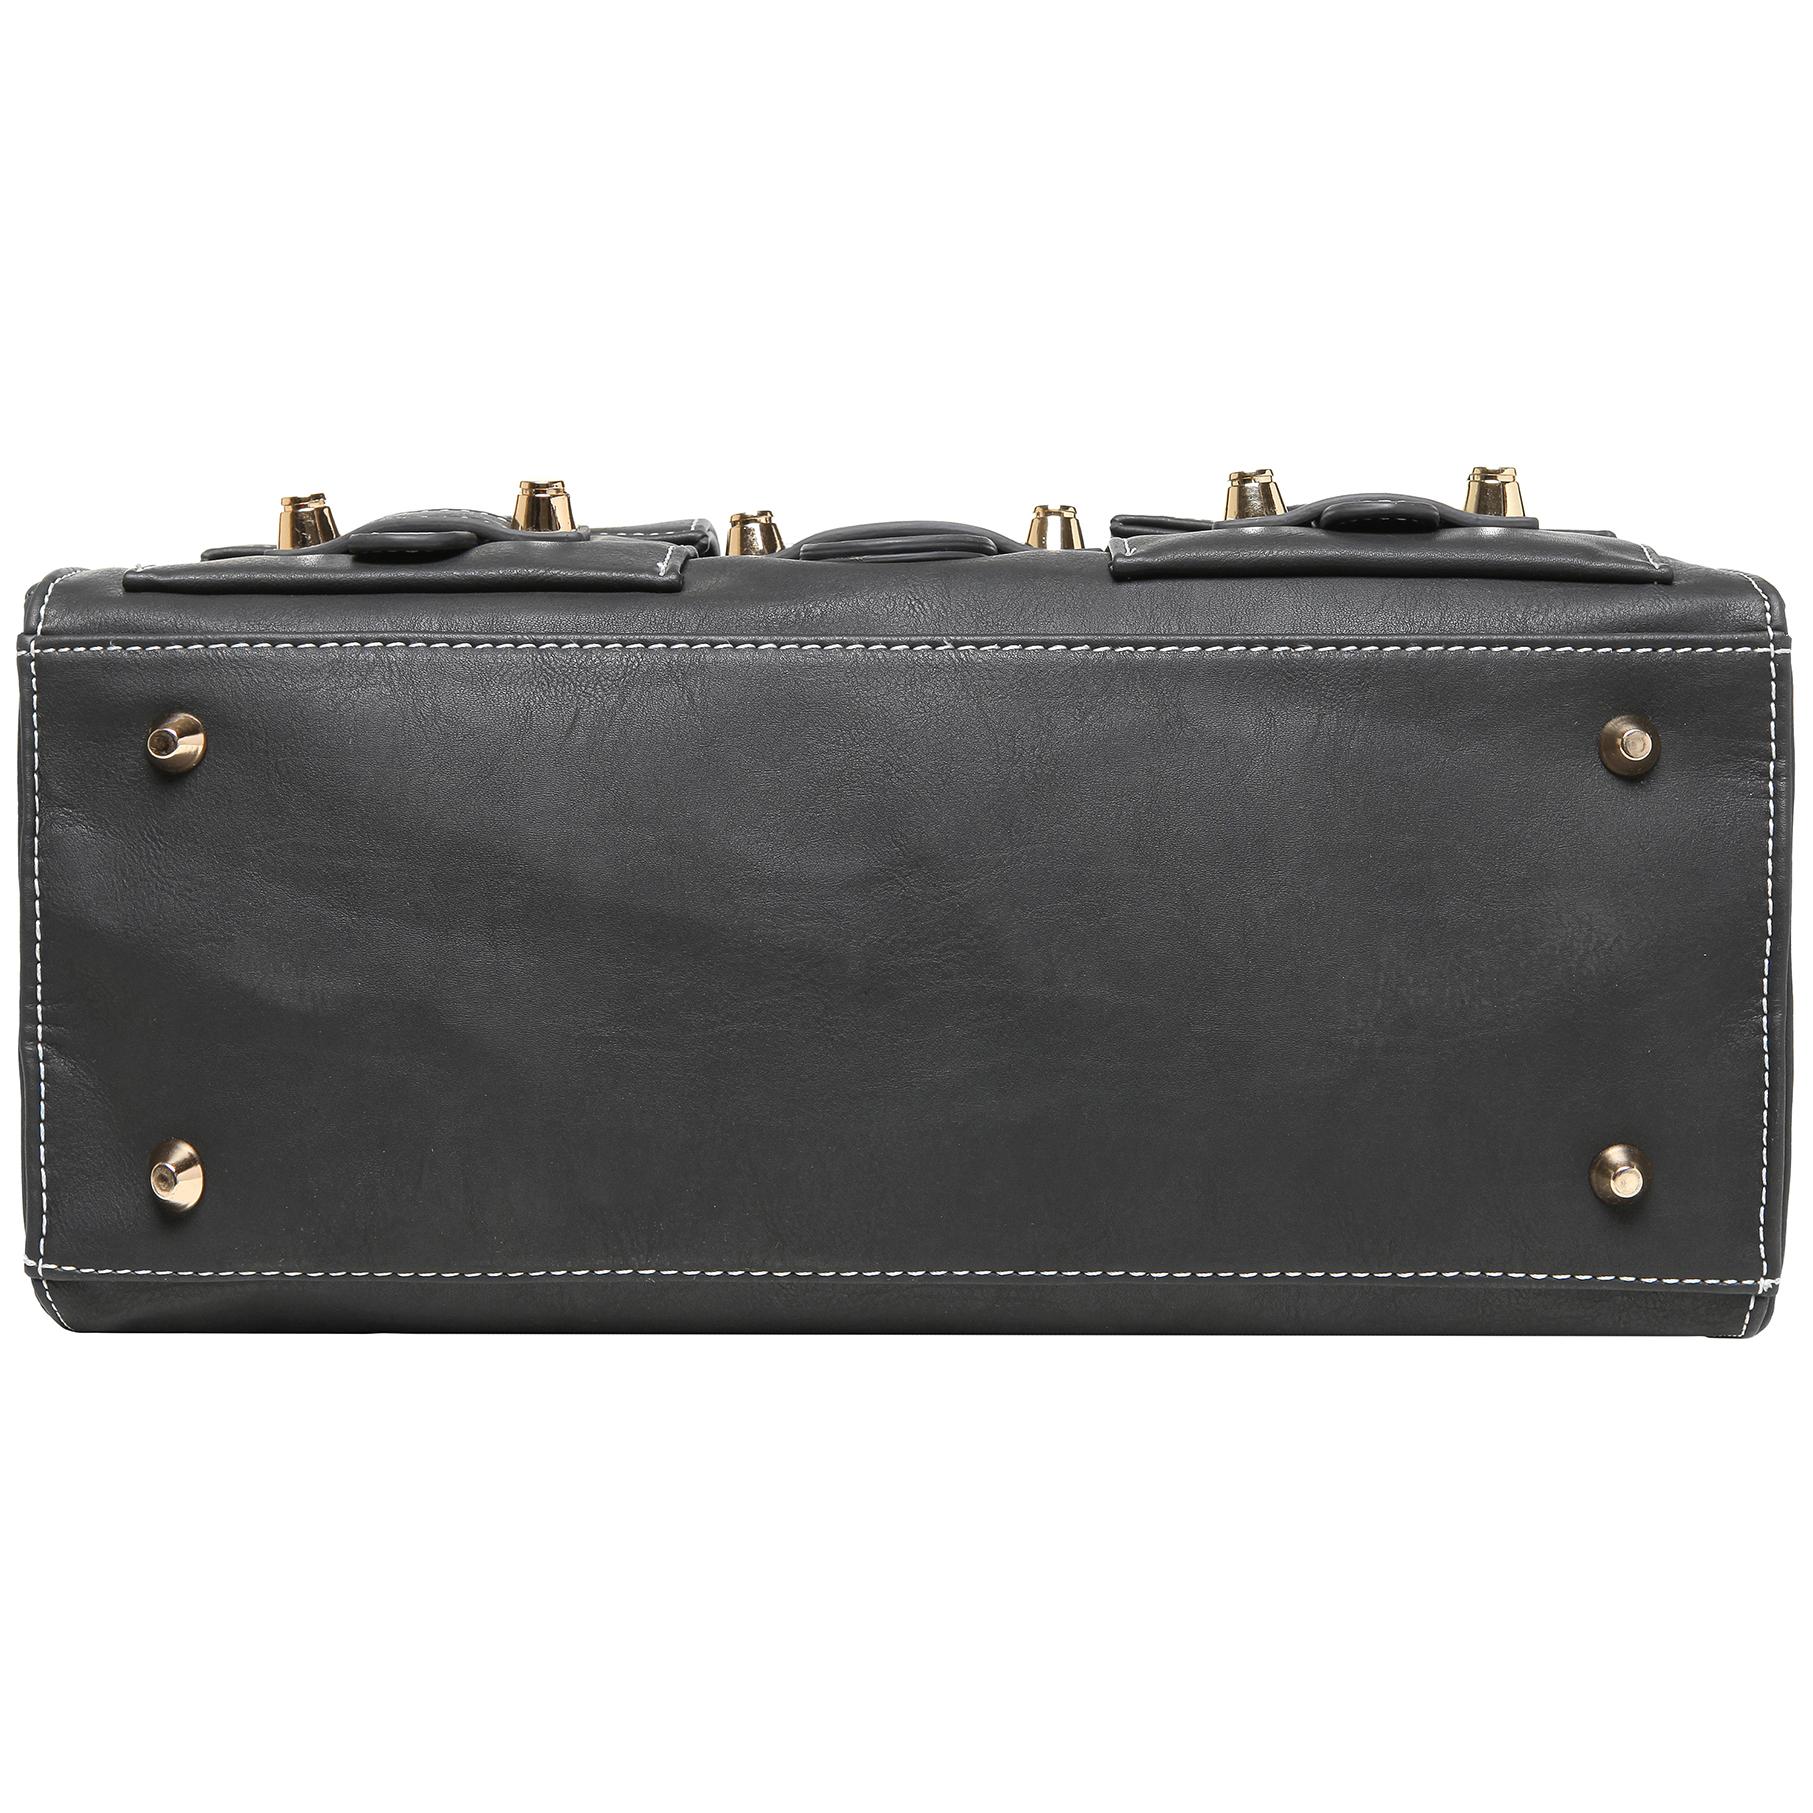 Anna Onyx Black satchel style womens designer handbag bottom image